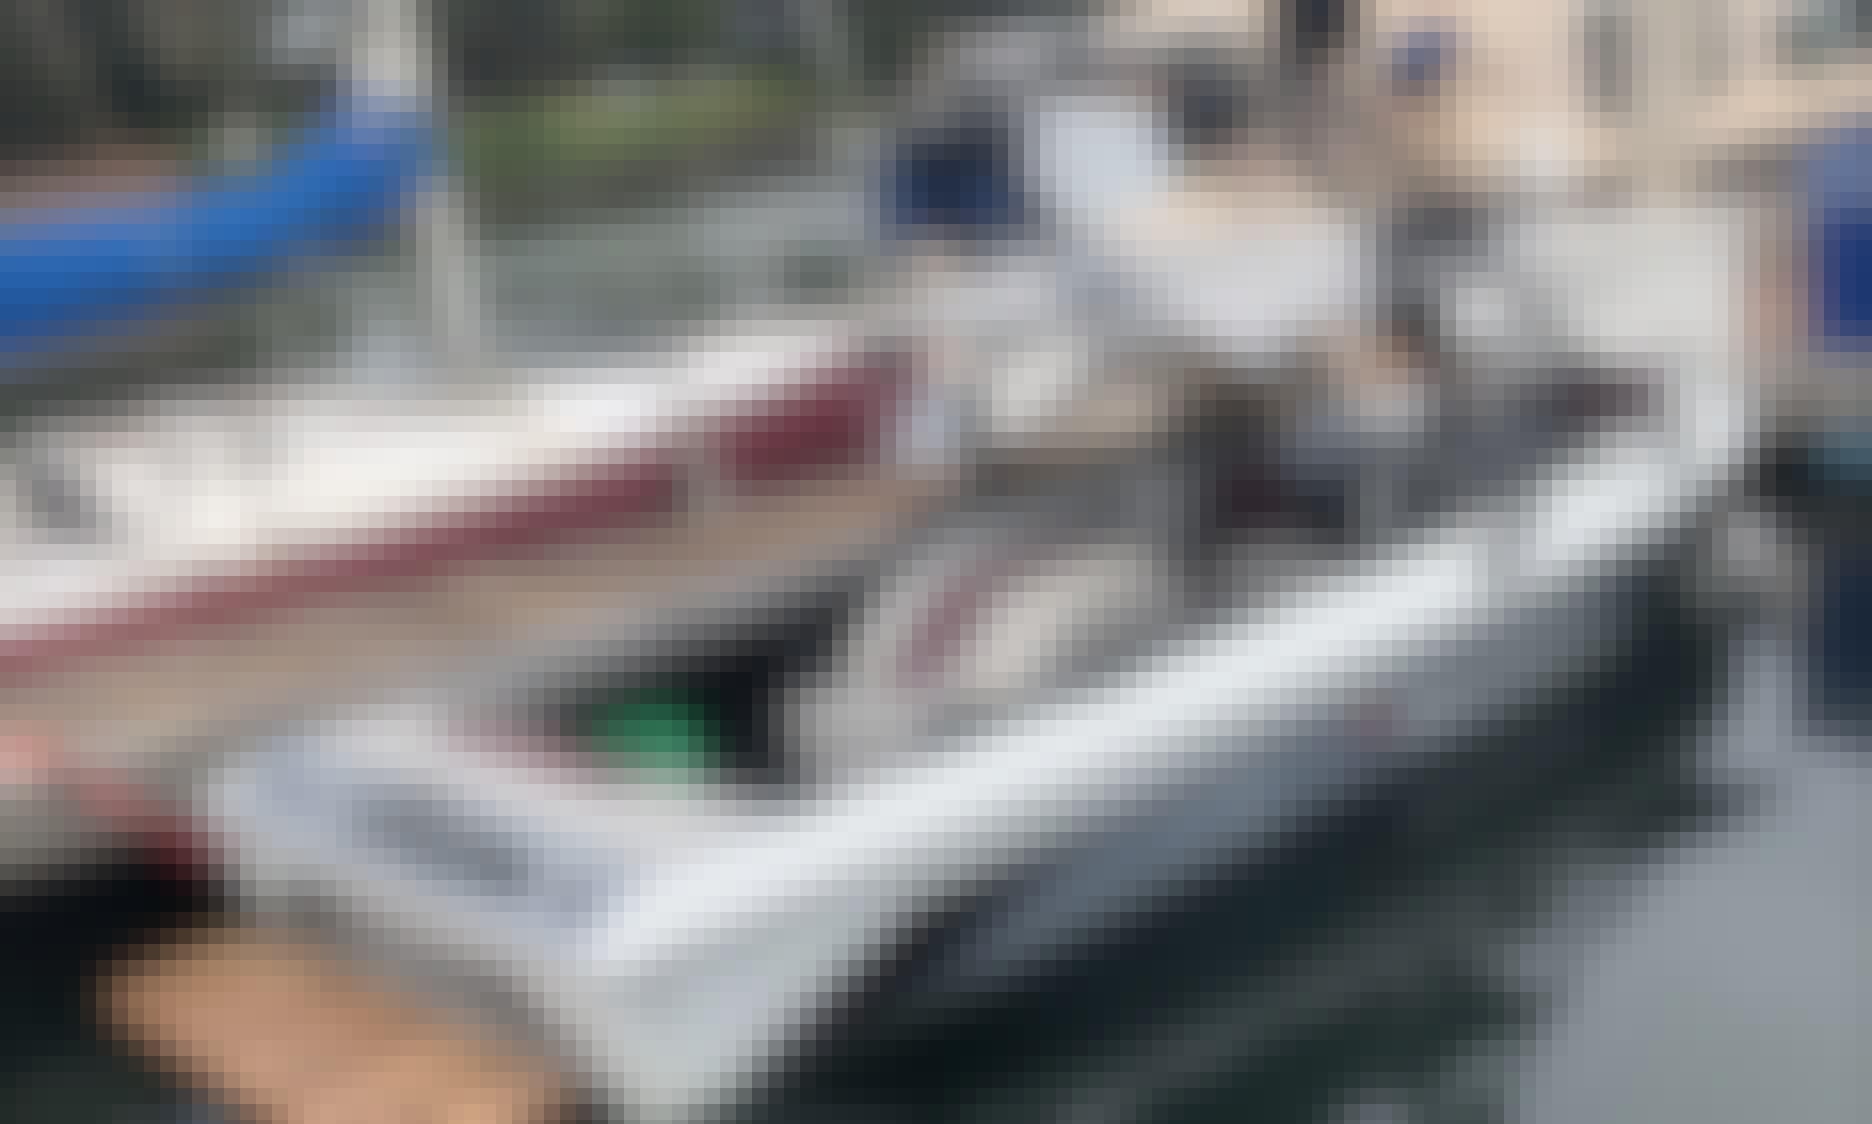 Amazing Water Sports Boat Malibu Sunsetter 20FT for Cruising, Tubing ,Wakeboarding-10 People